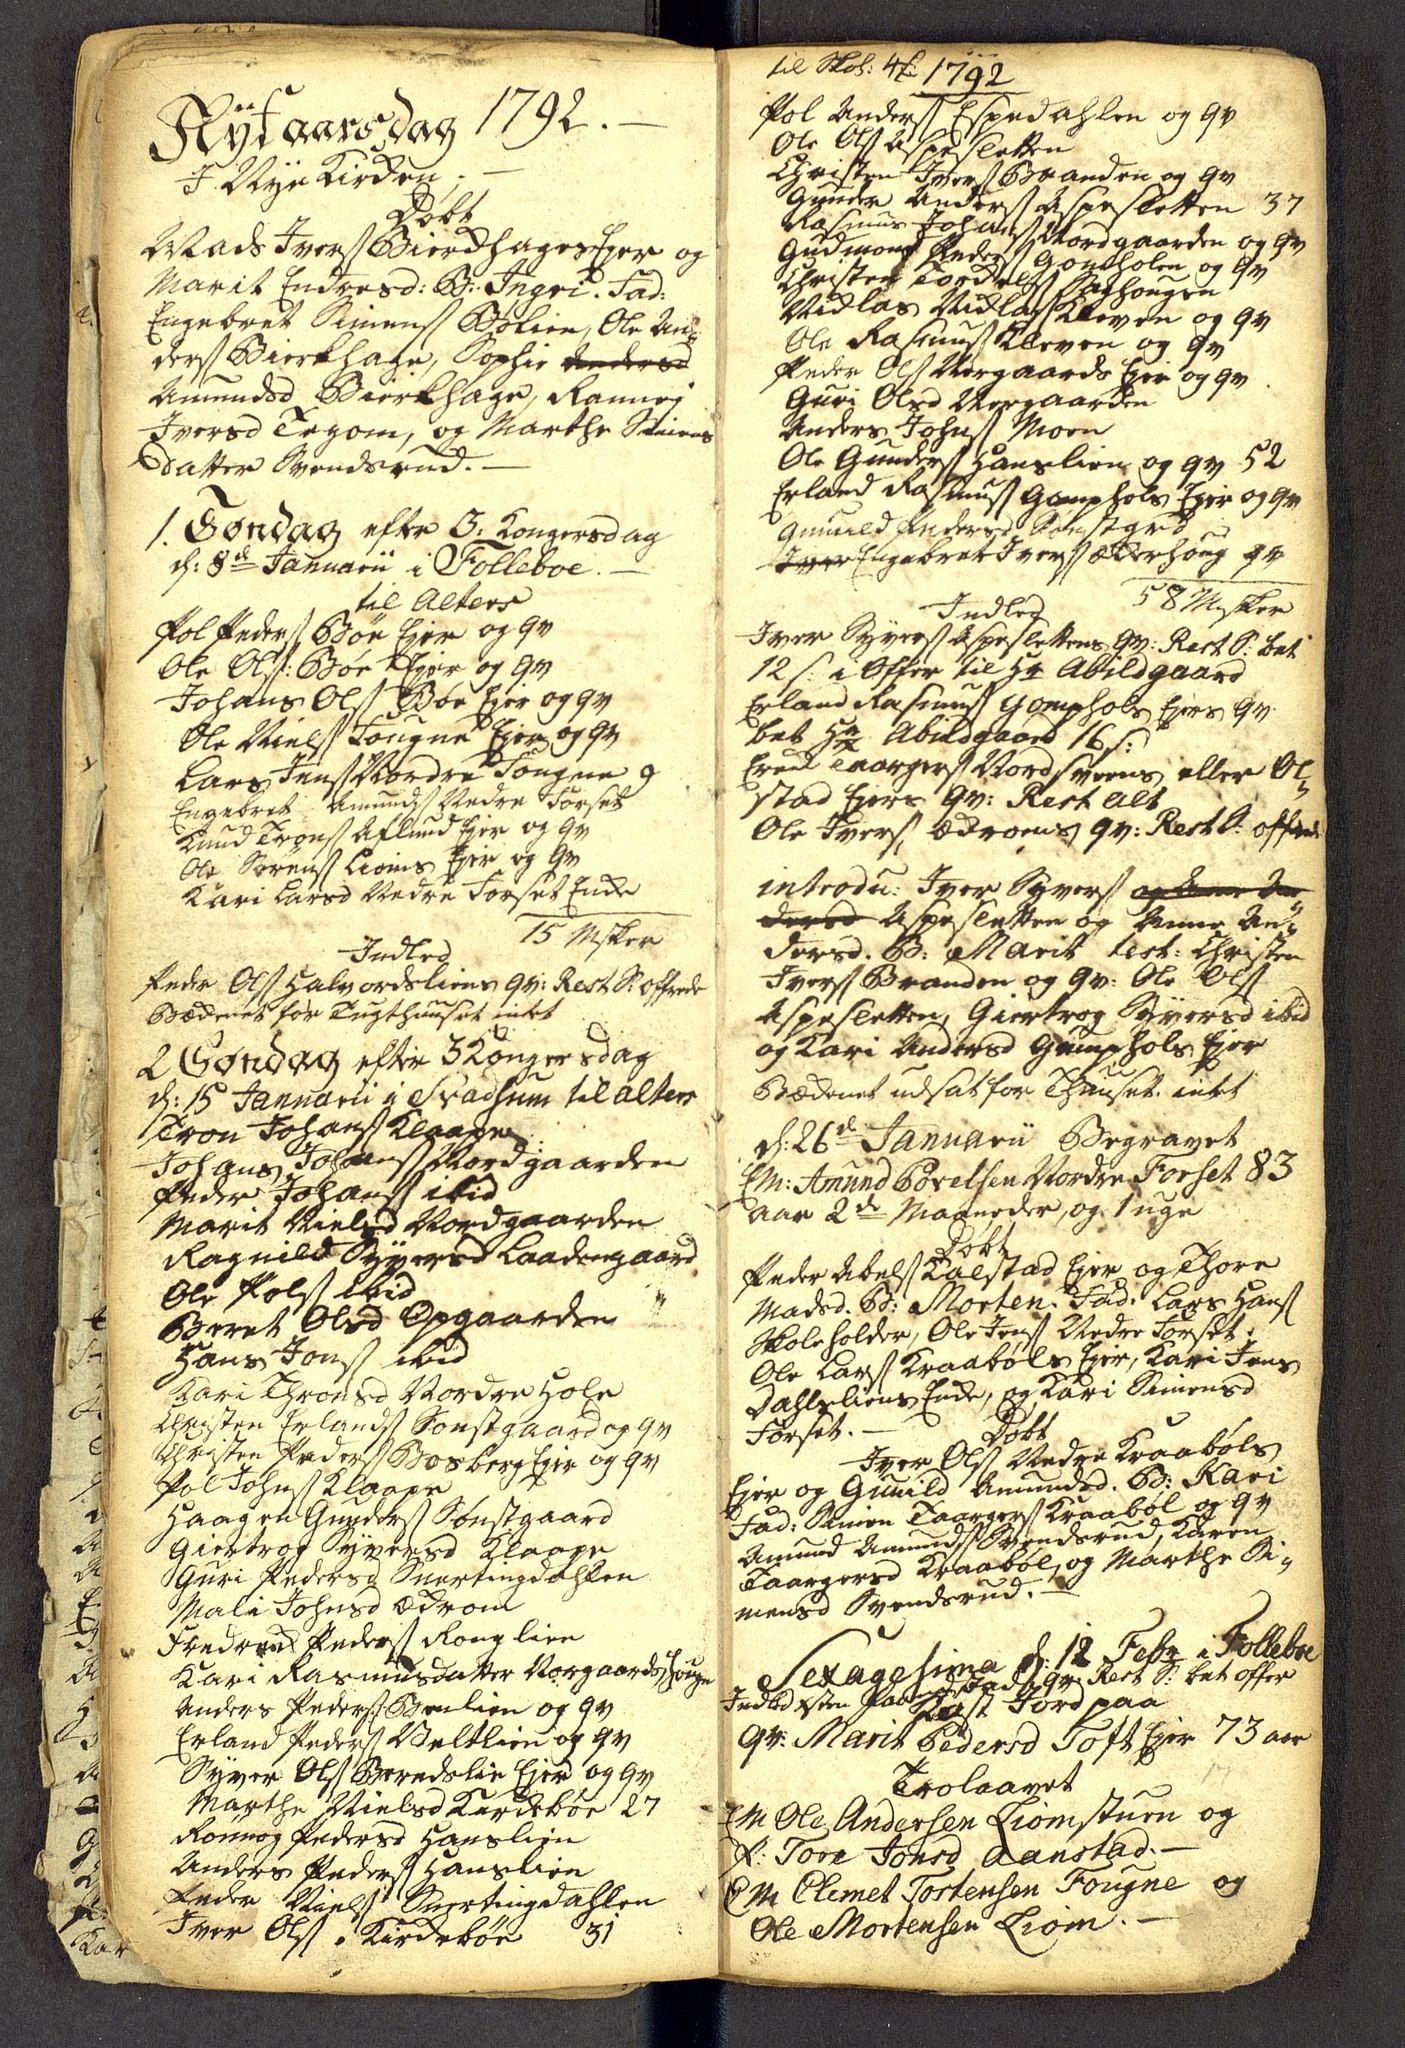 SAH, Gausdal prestekontor, Kladd til kirkebok nr. -, 1786-1793